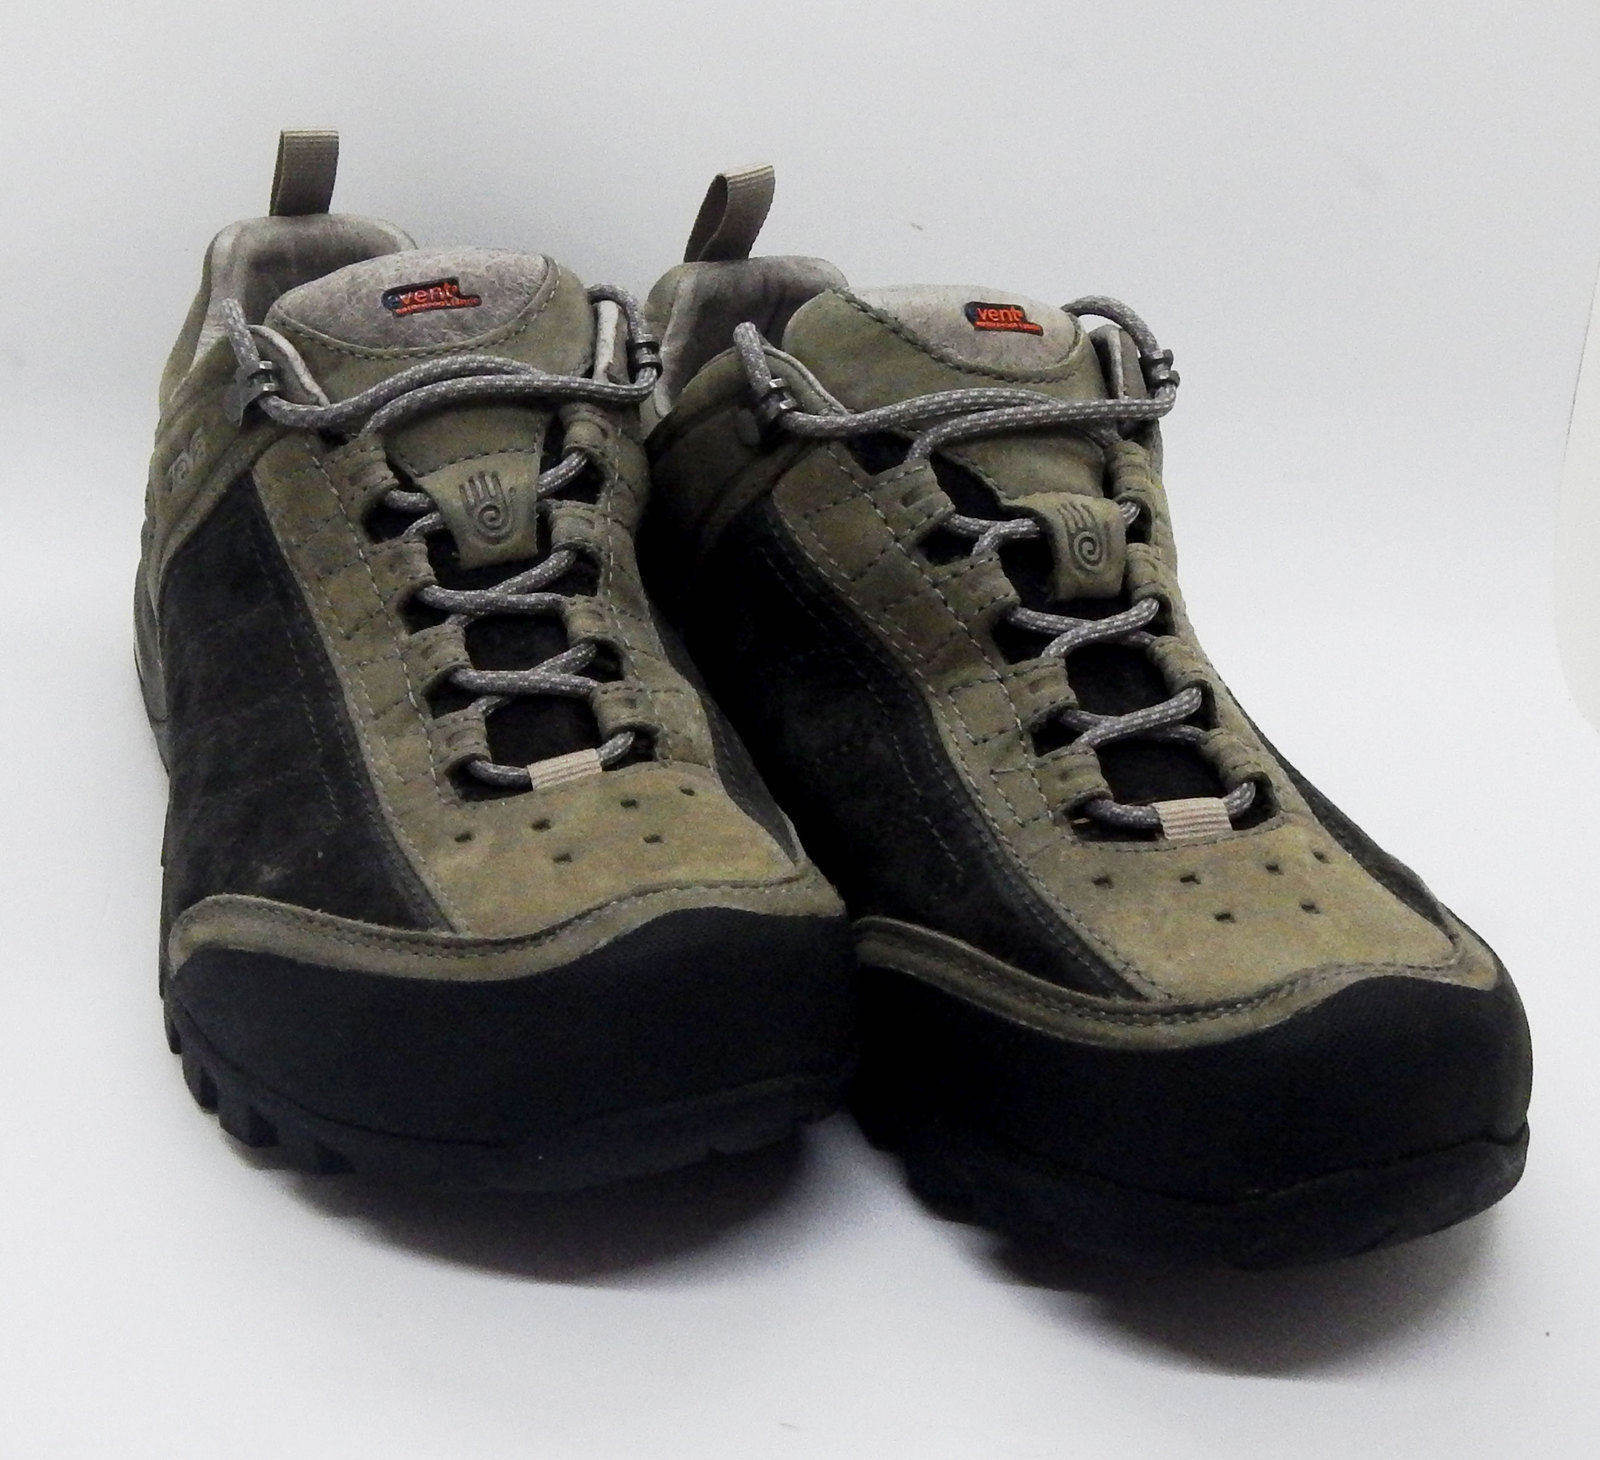 9dc9a72da TEVA Men 7.5 RIVA Event Water Proof Hiking Shoe Tan   Black Style  4103